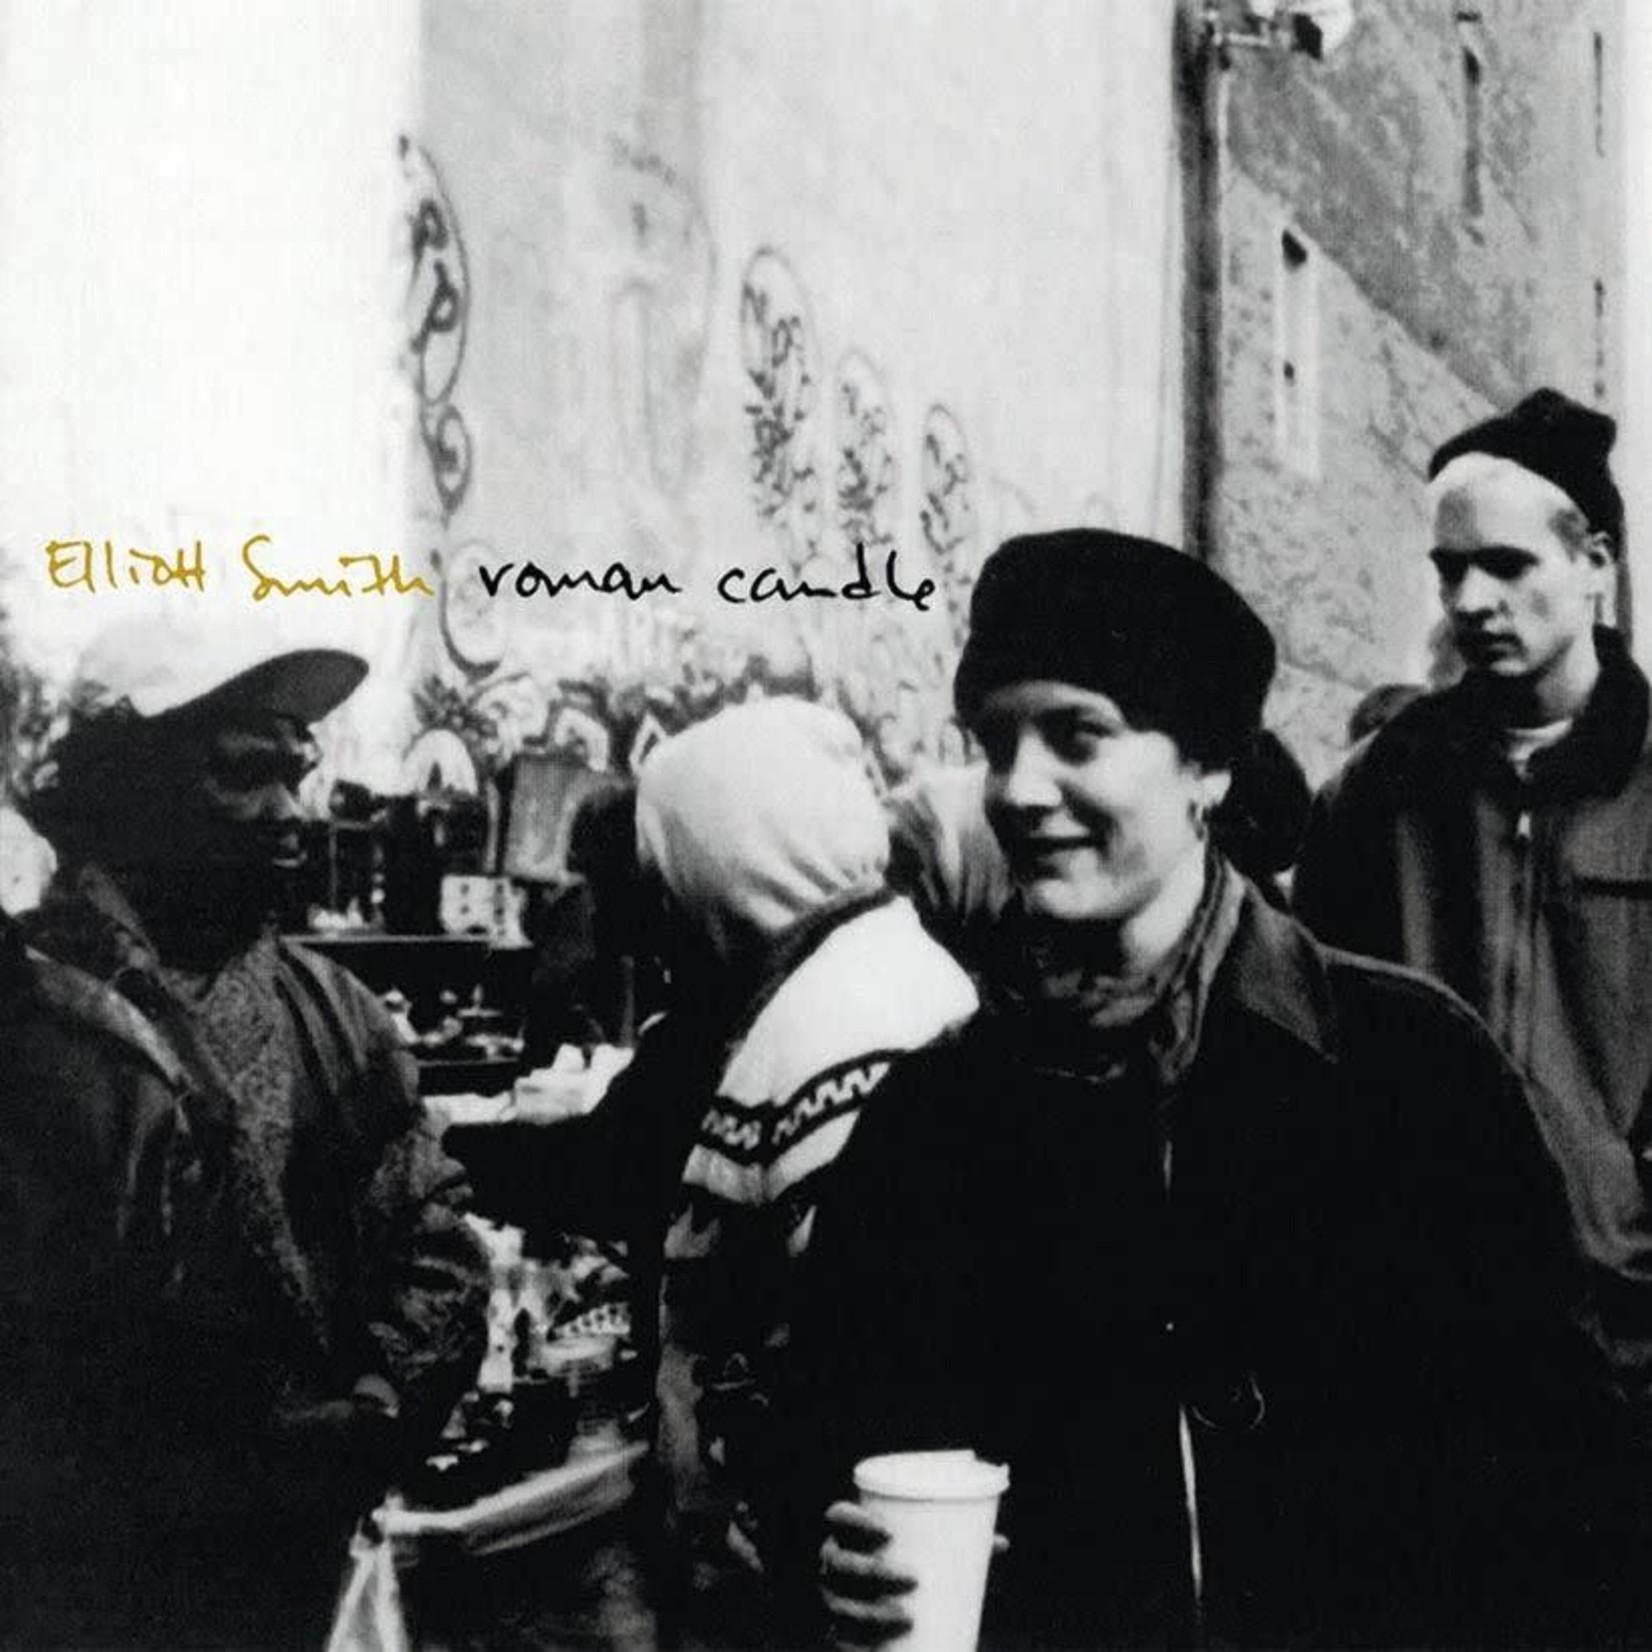 [New] Smith, Elliott: Roman Candle